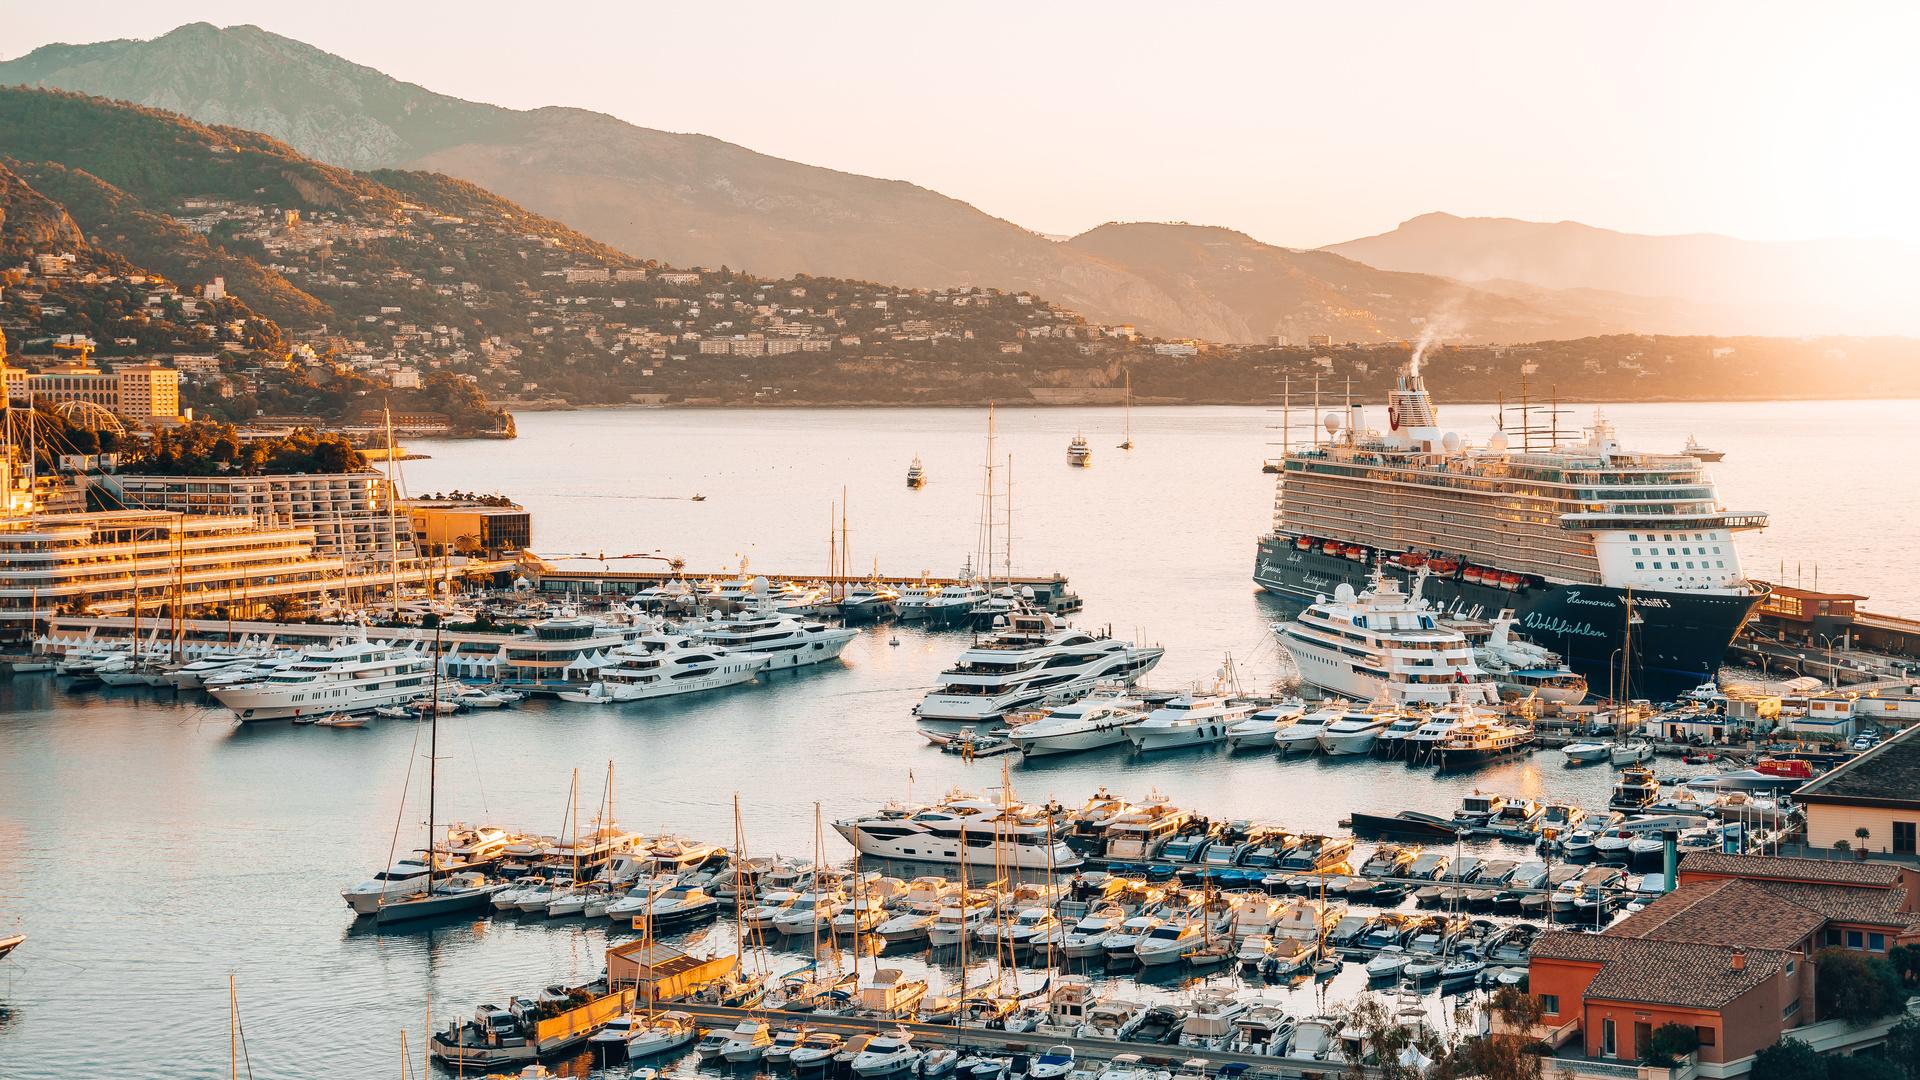 port, yachts, cruise ships, pier, monte carlo, monaco, cruise liner, tui cruises